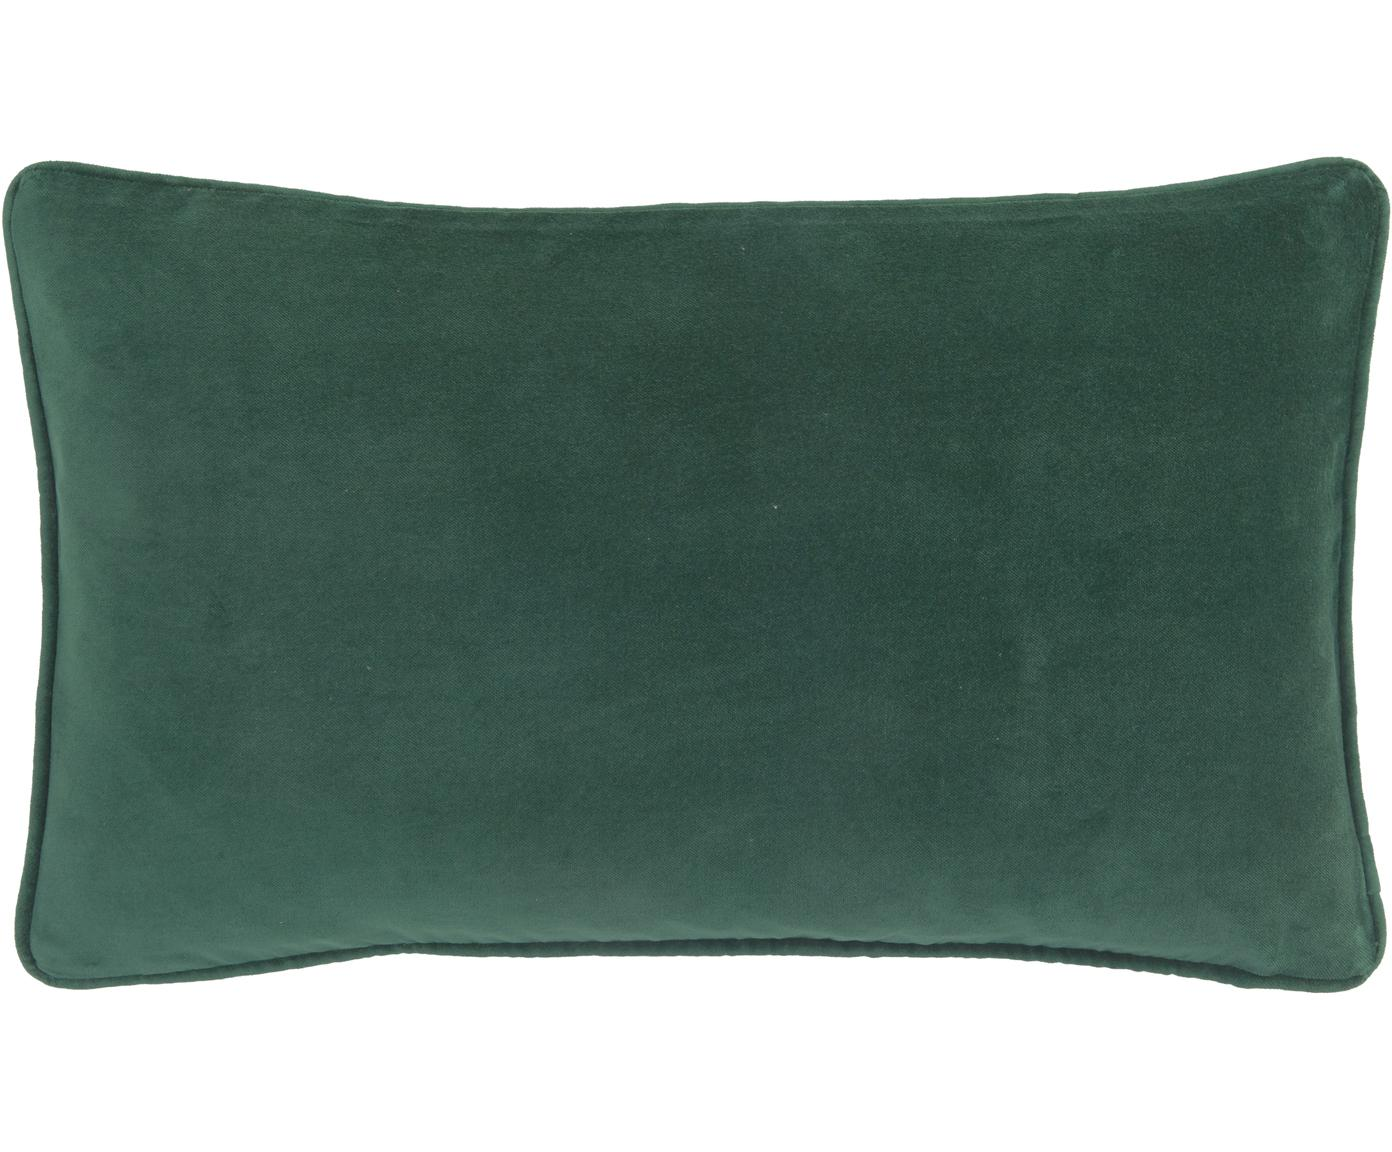 Effen fluwelen kussenhoes Dana in smaragdgroen, Katoenfluweel, Smaragdgroen, 30 x 50 cm